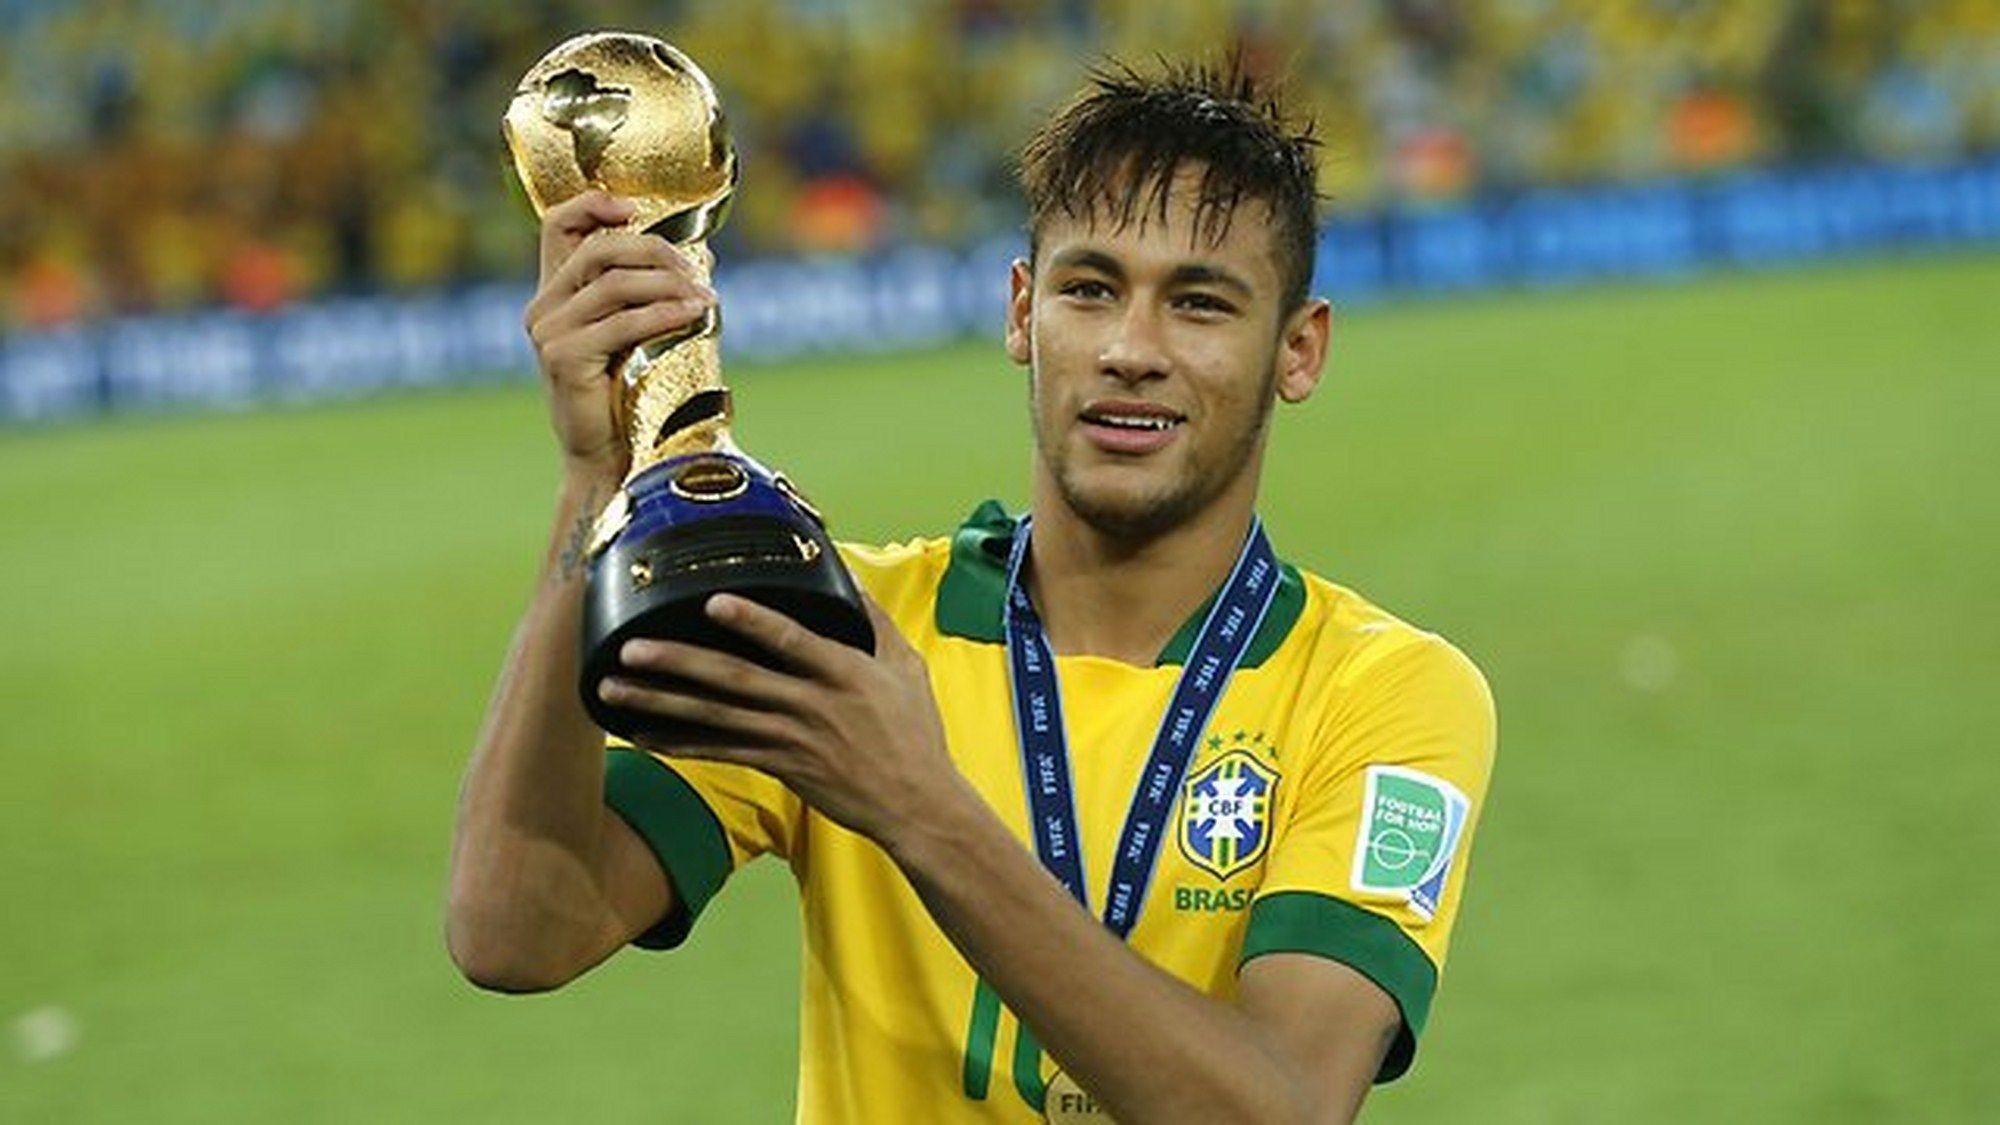 Neymar Baercelona Wallpaper Photo with HD Wallpaper Resolution 1600×900 Neymar  Wallpaper (53 Wallpapers